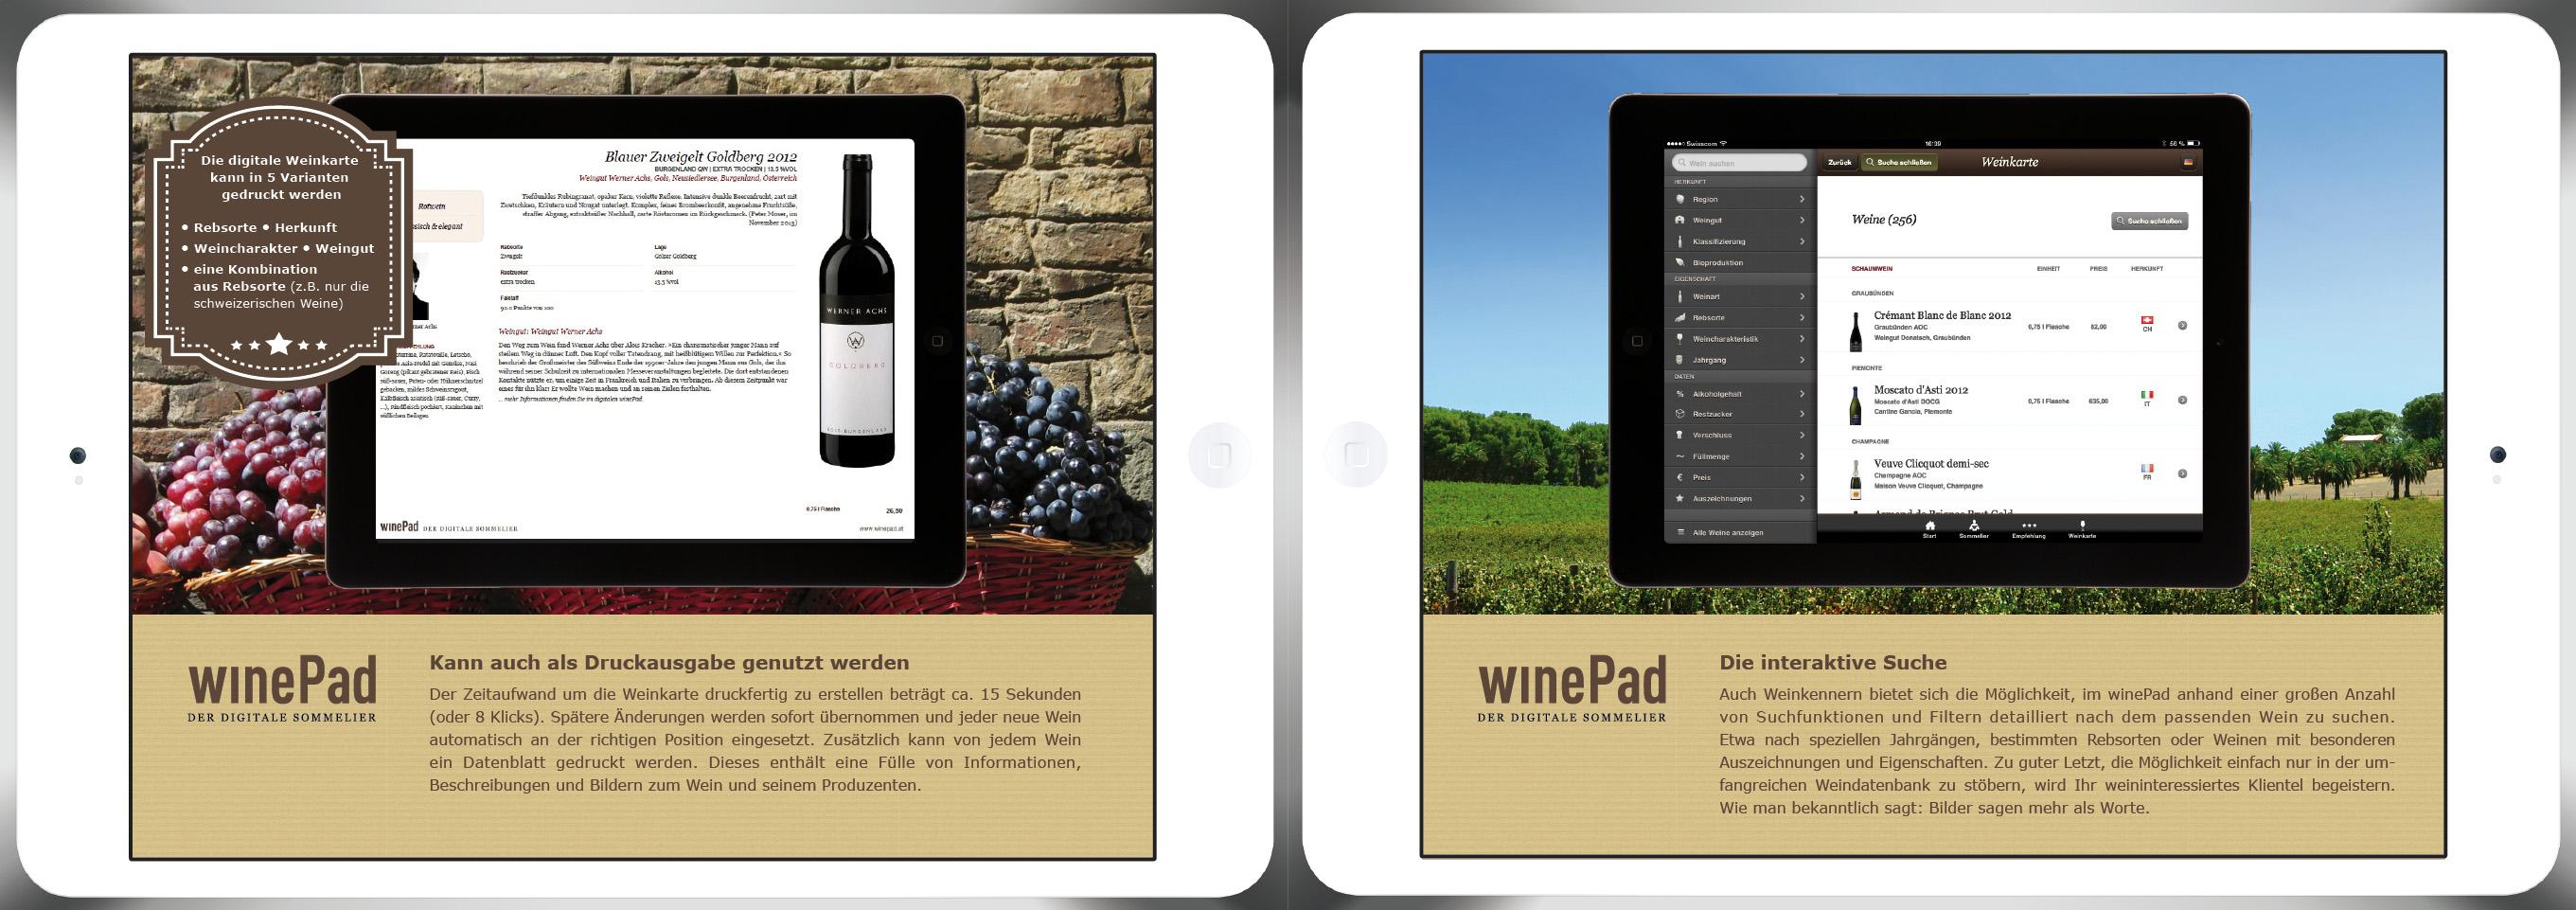 WinePad_iPad-Broschuere_Inhalt2